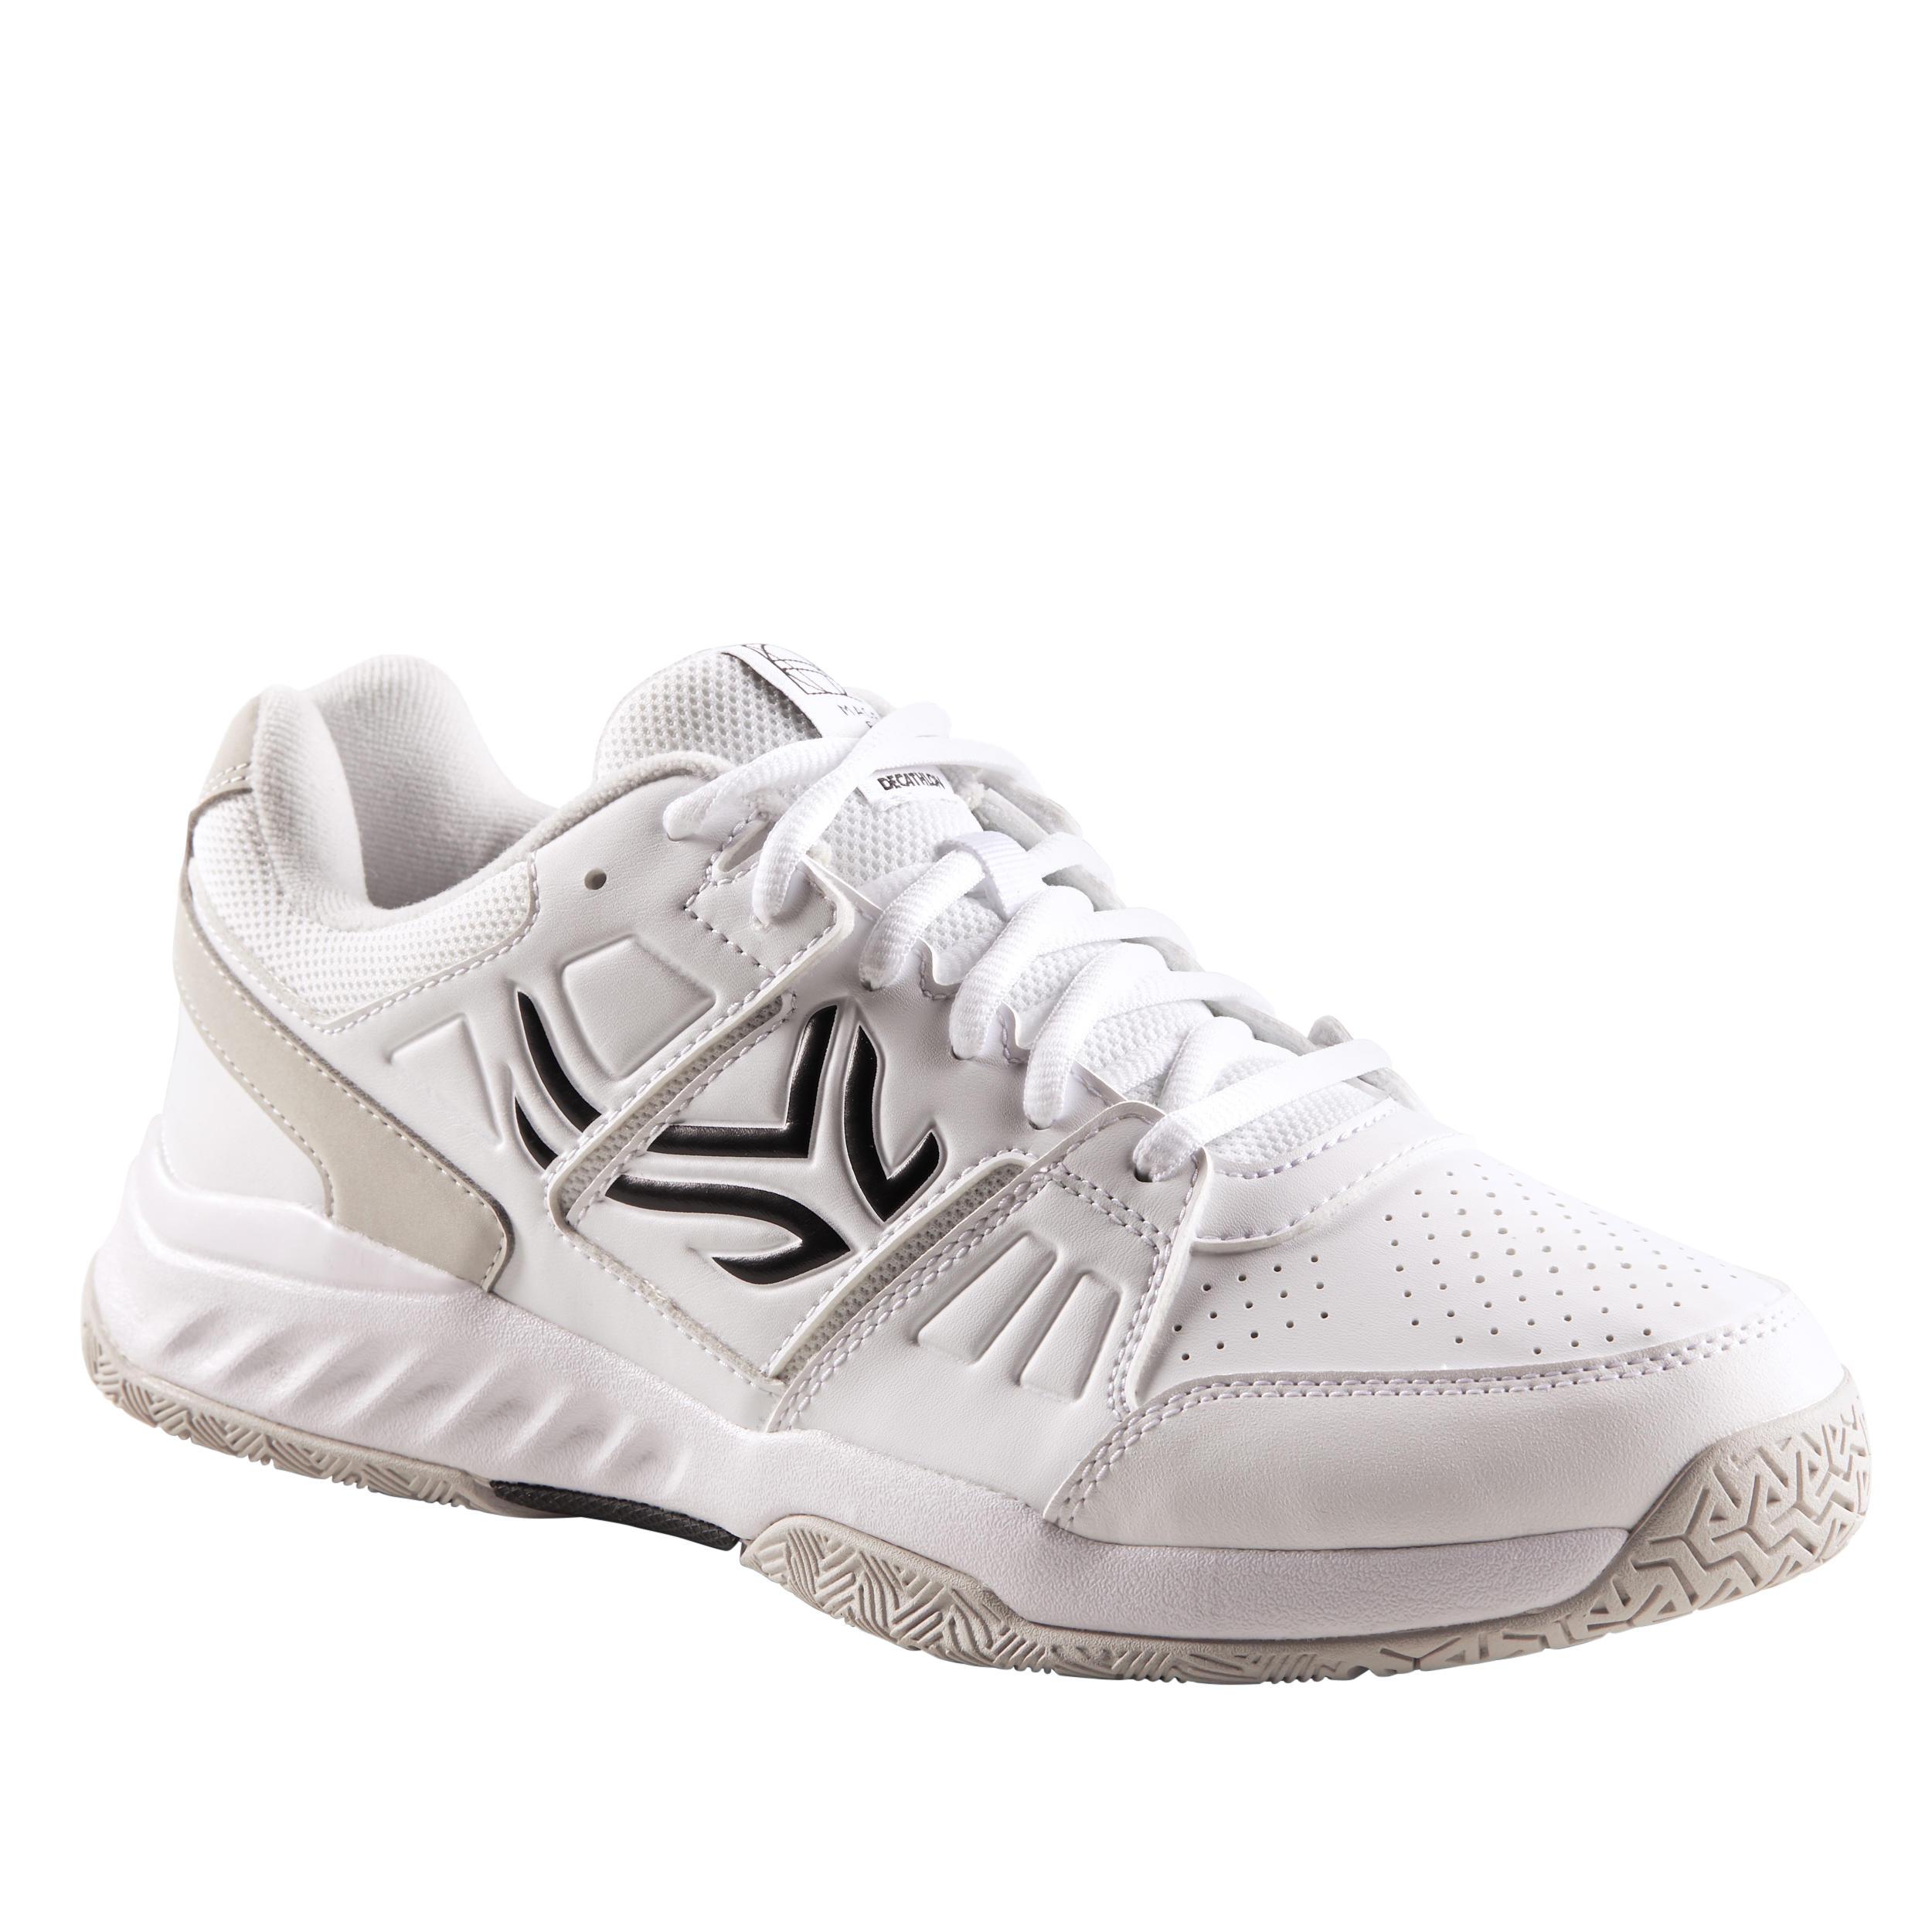 Men's Shoes By Sports | Decathlon Hong Kong